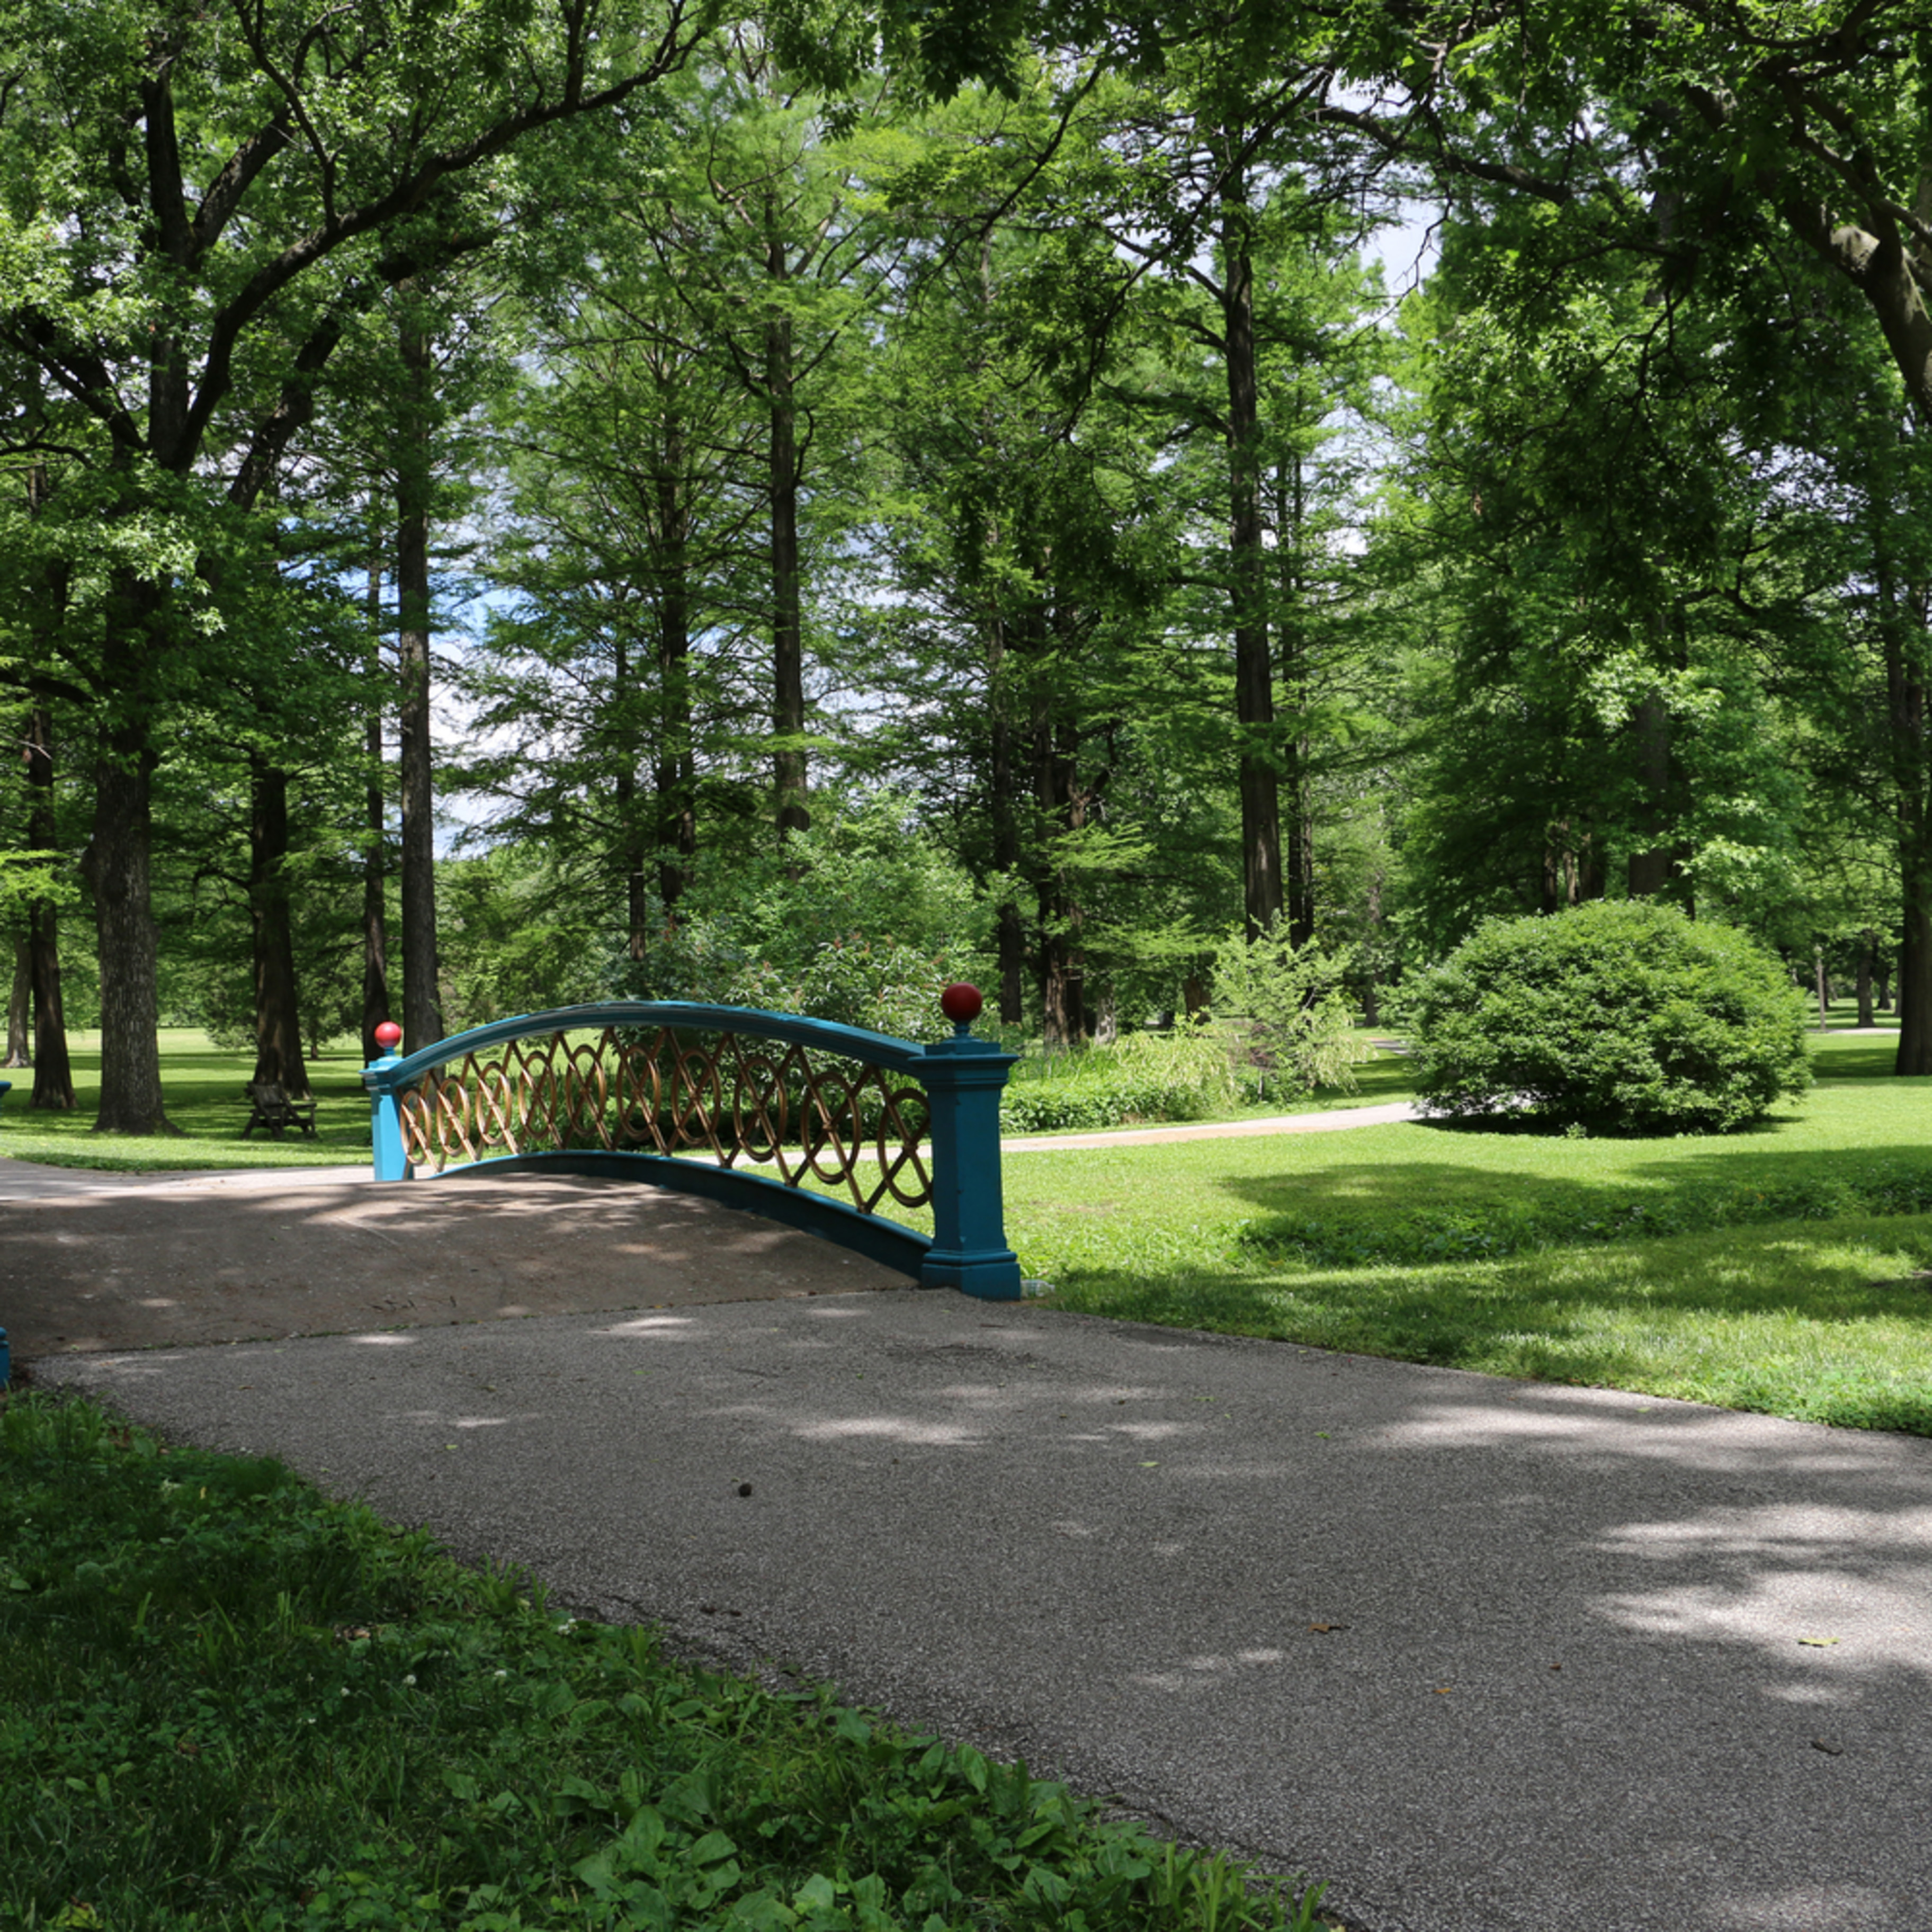 Elizabethmoore footbridgetowergrovepark 6392 wysdte